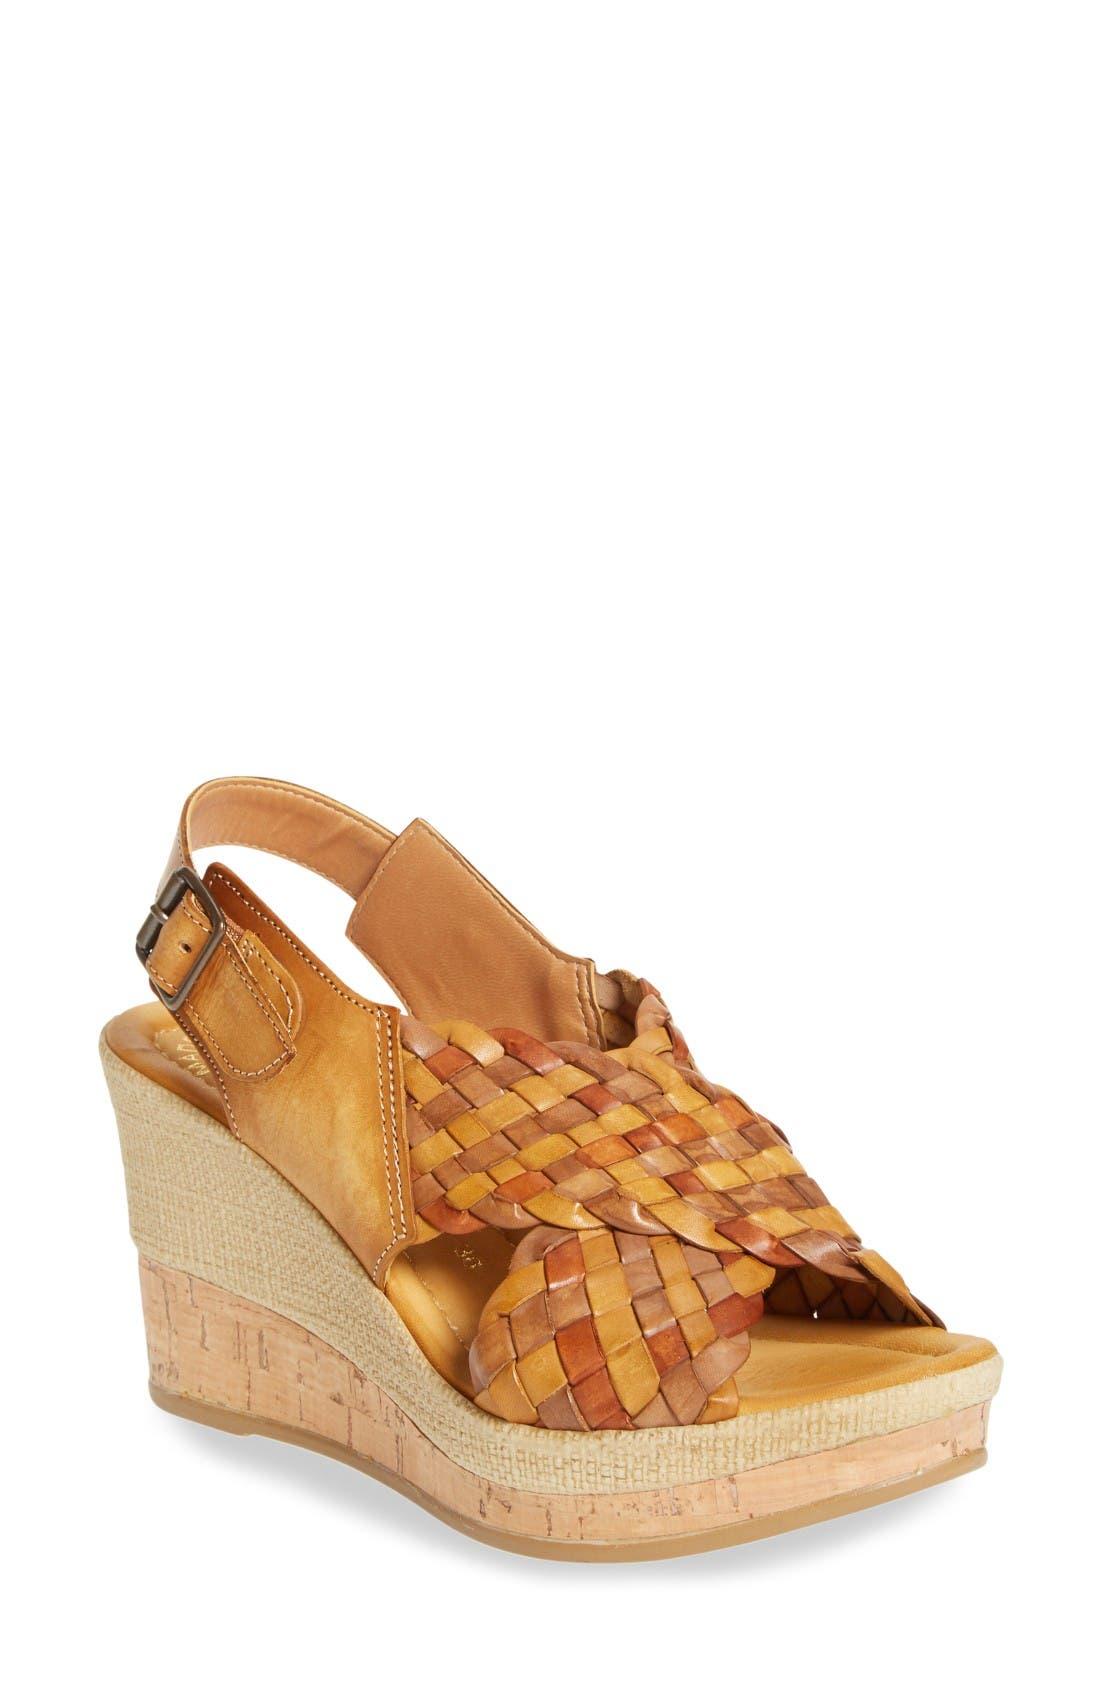 Love Wedge Sandal,                             Main thumbnail 1, color,                             Earth Leather